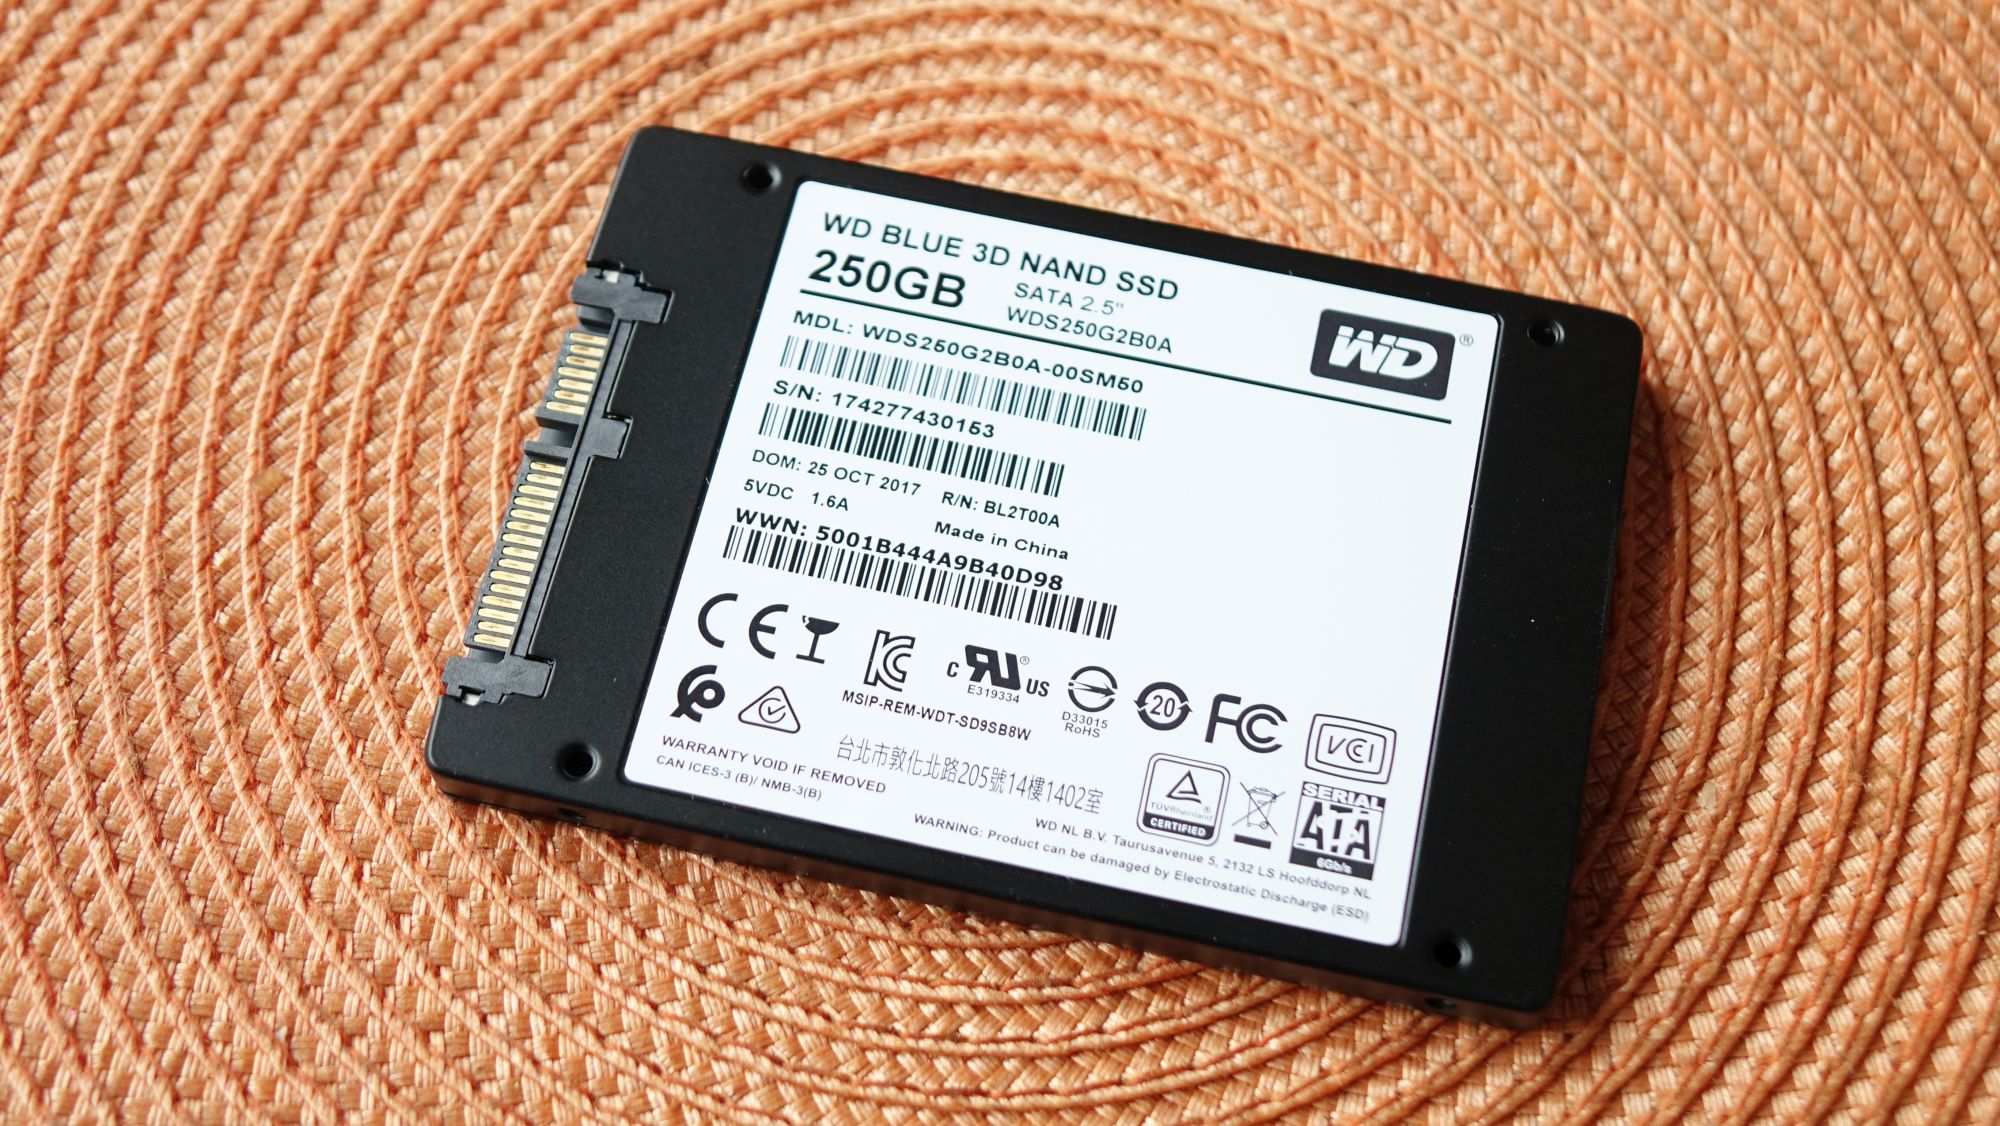 WD Blue 3D NAND SATA SSD маркировка